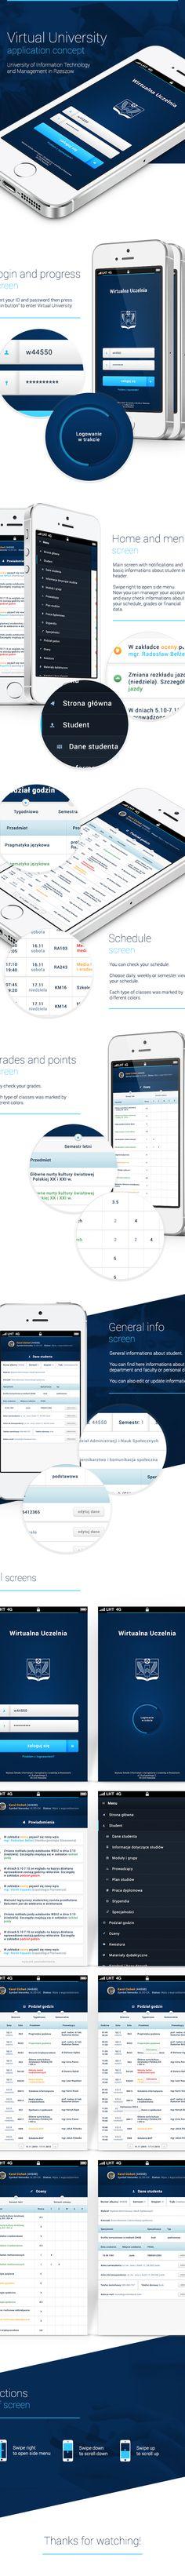 Virtual University -  application concept by Karol Cichoń, via Behance